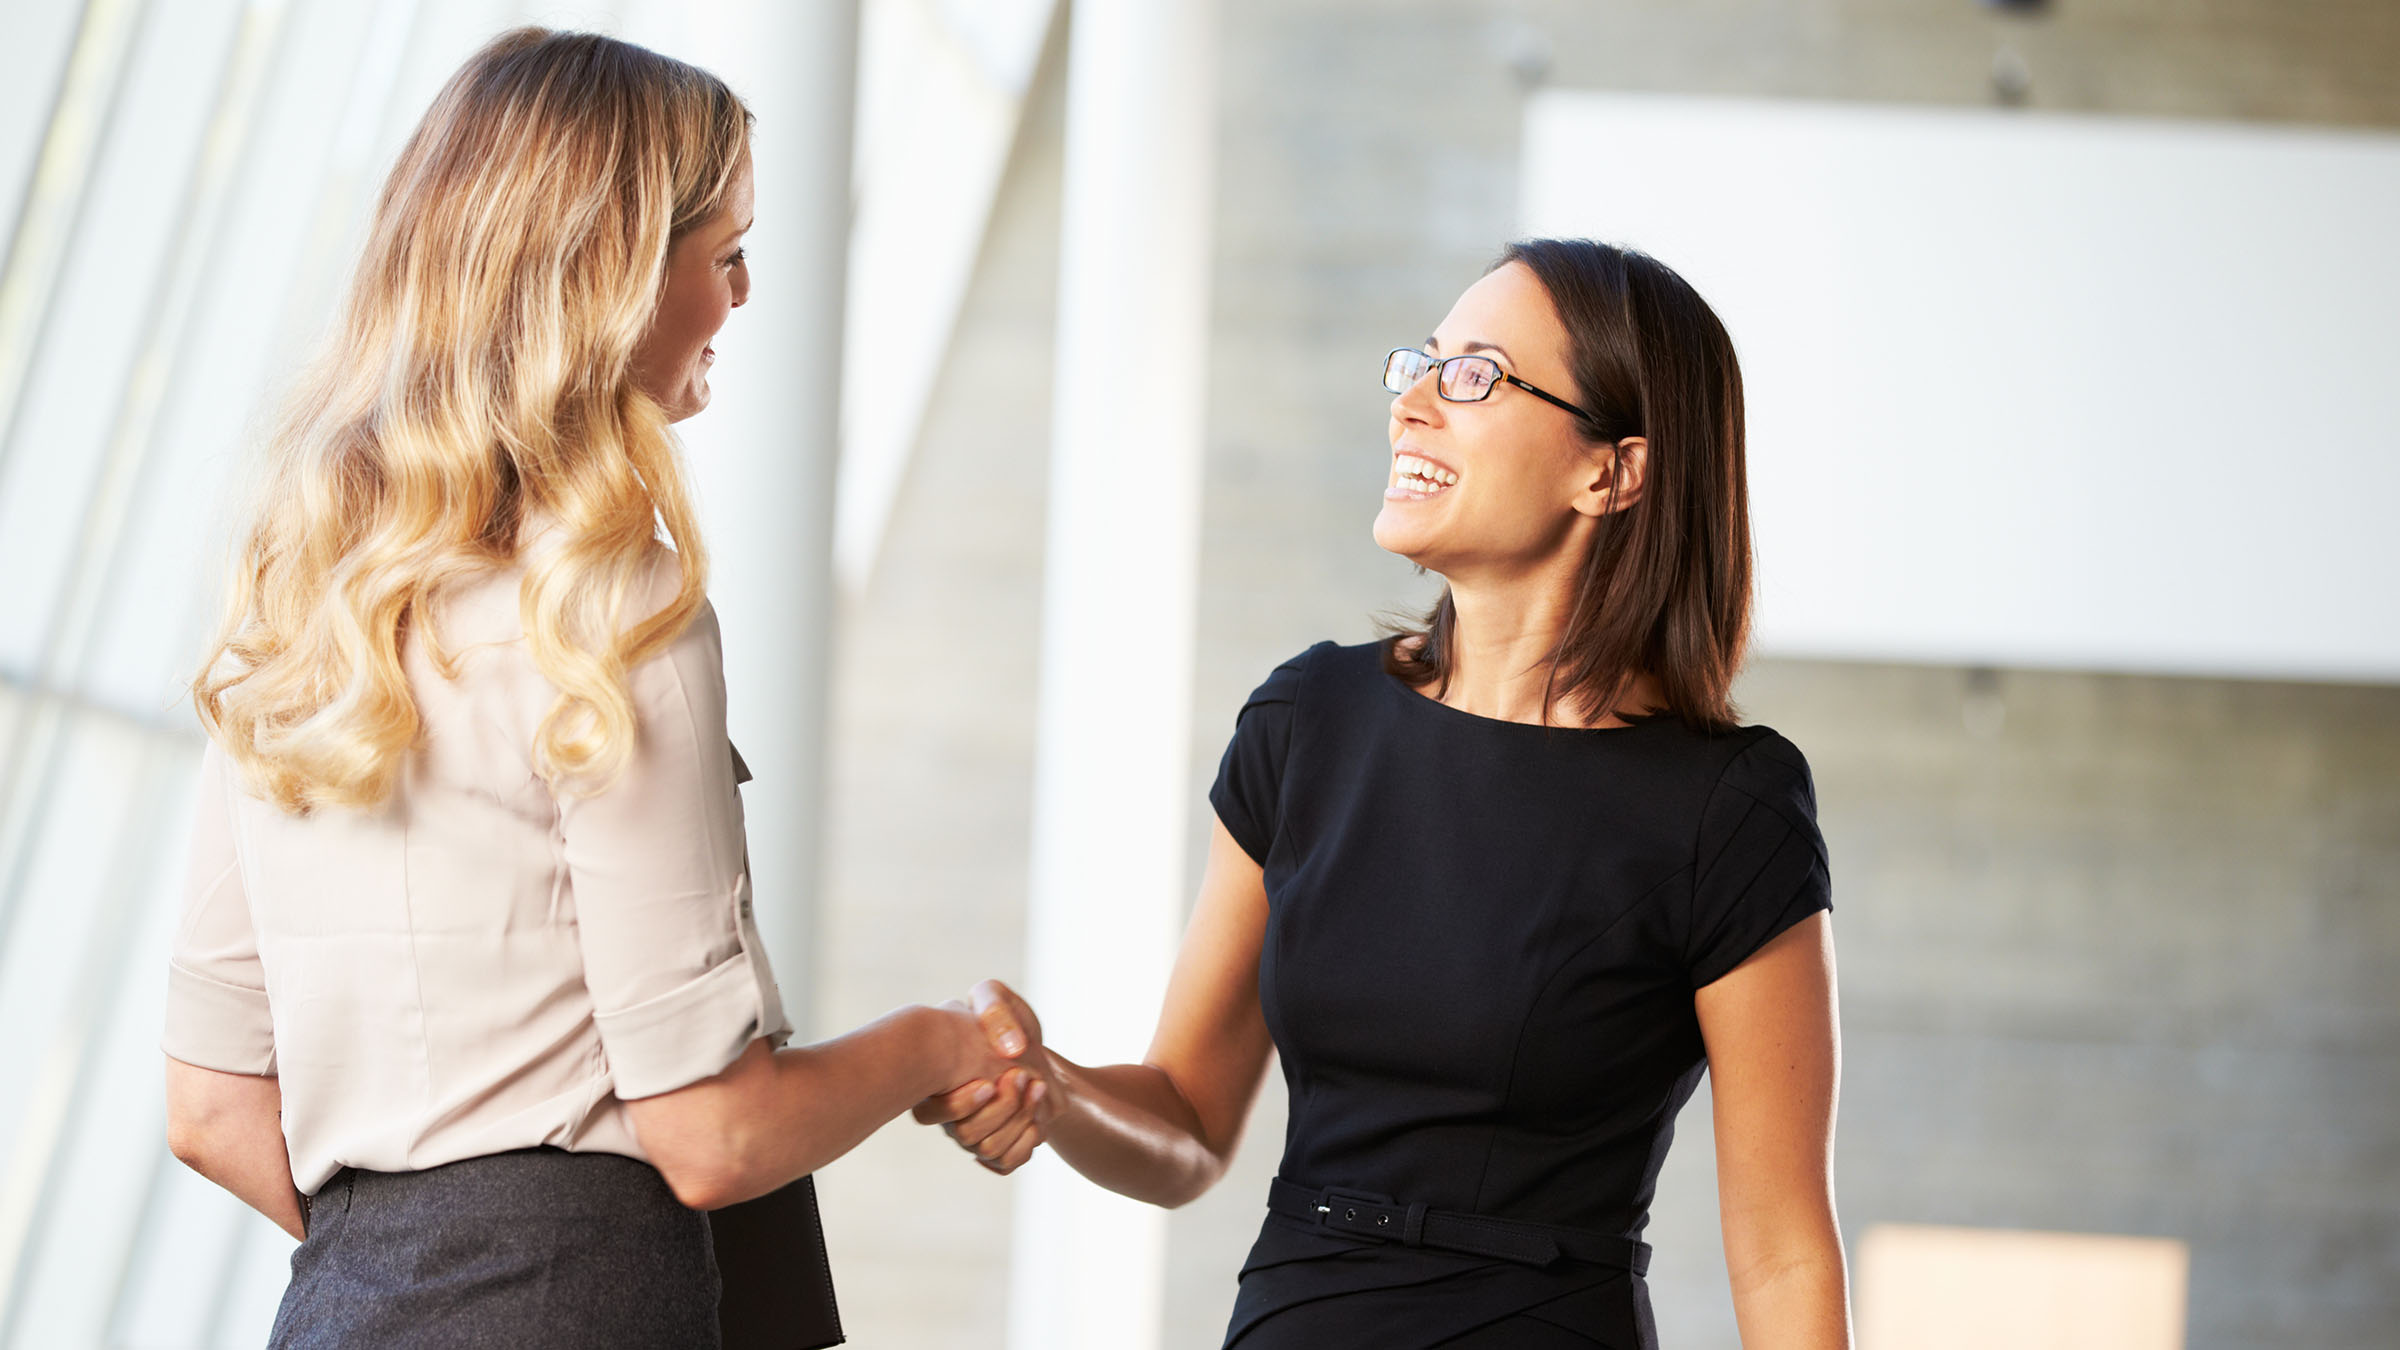 costumbres de Australia saludo entre mujeres